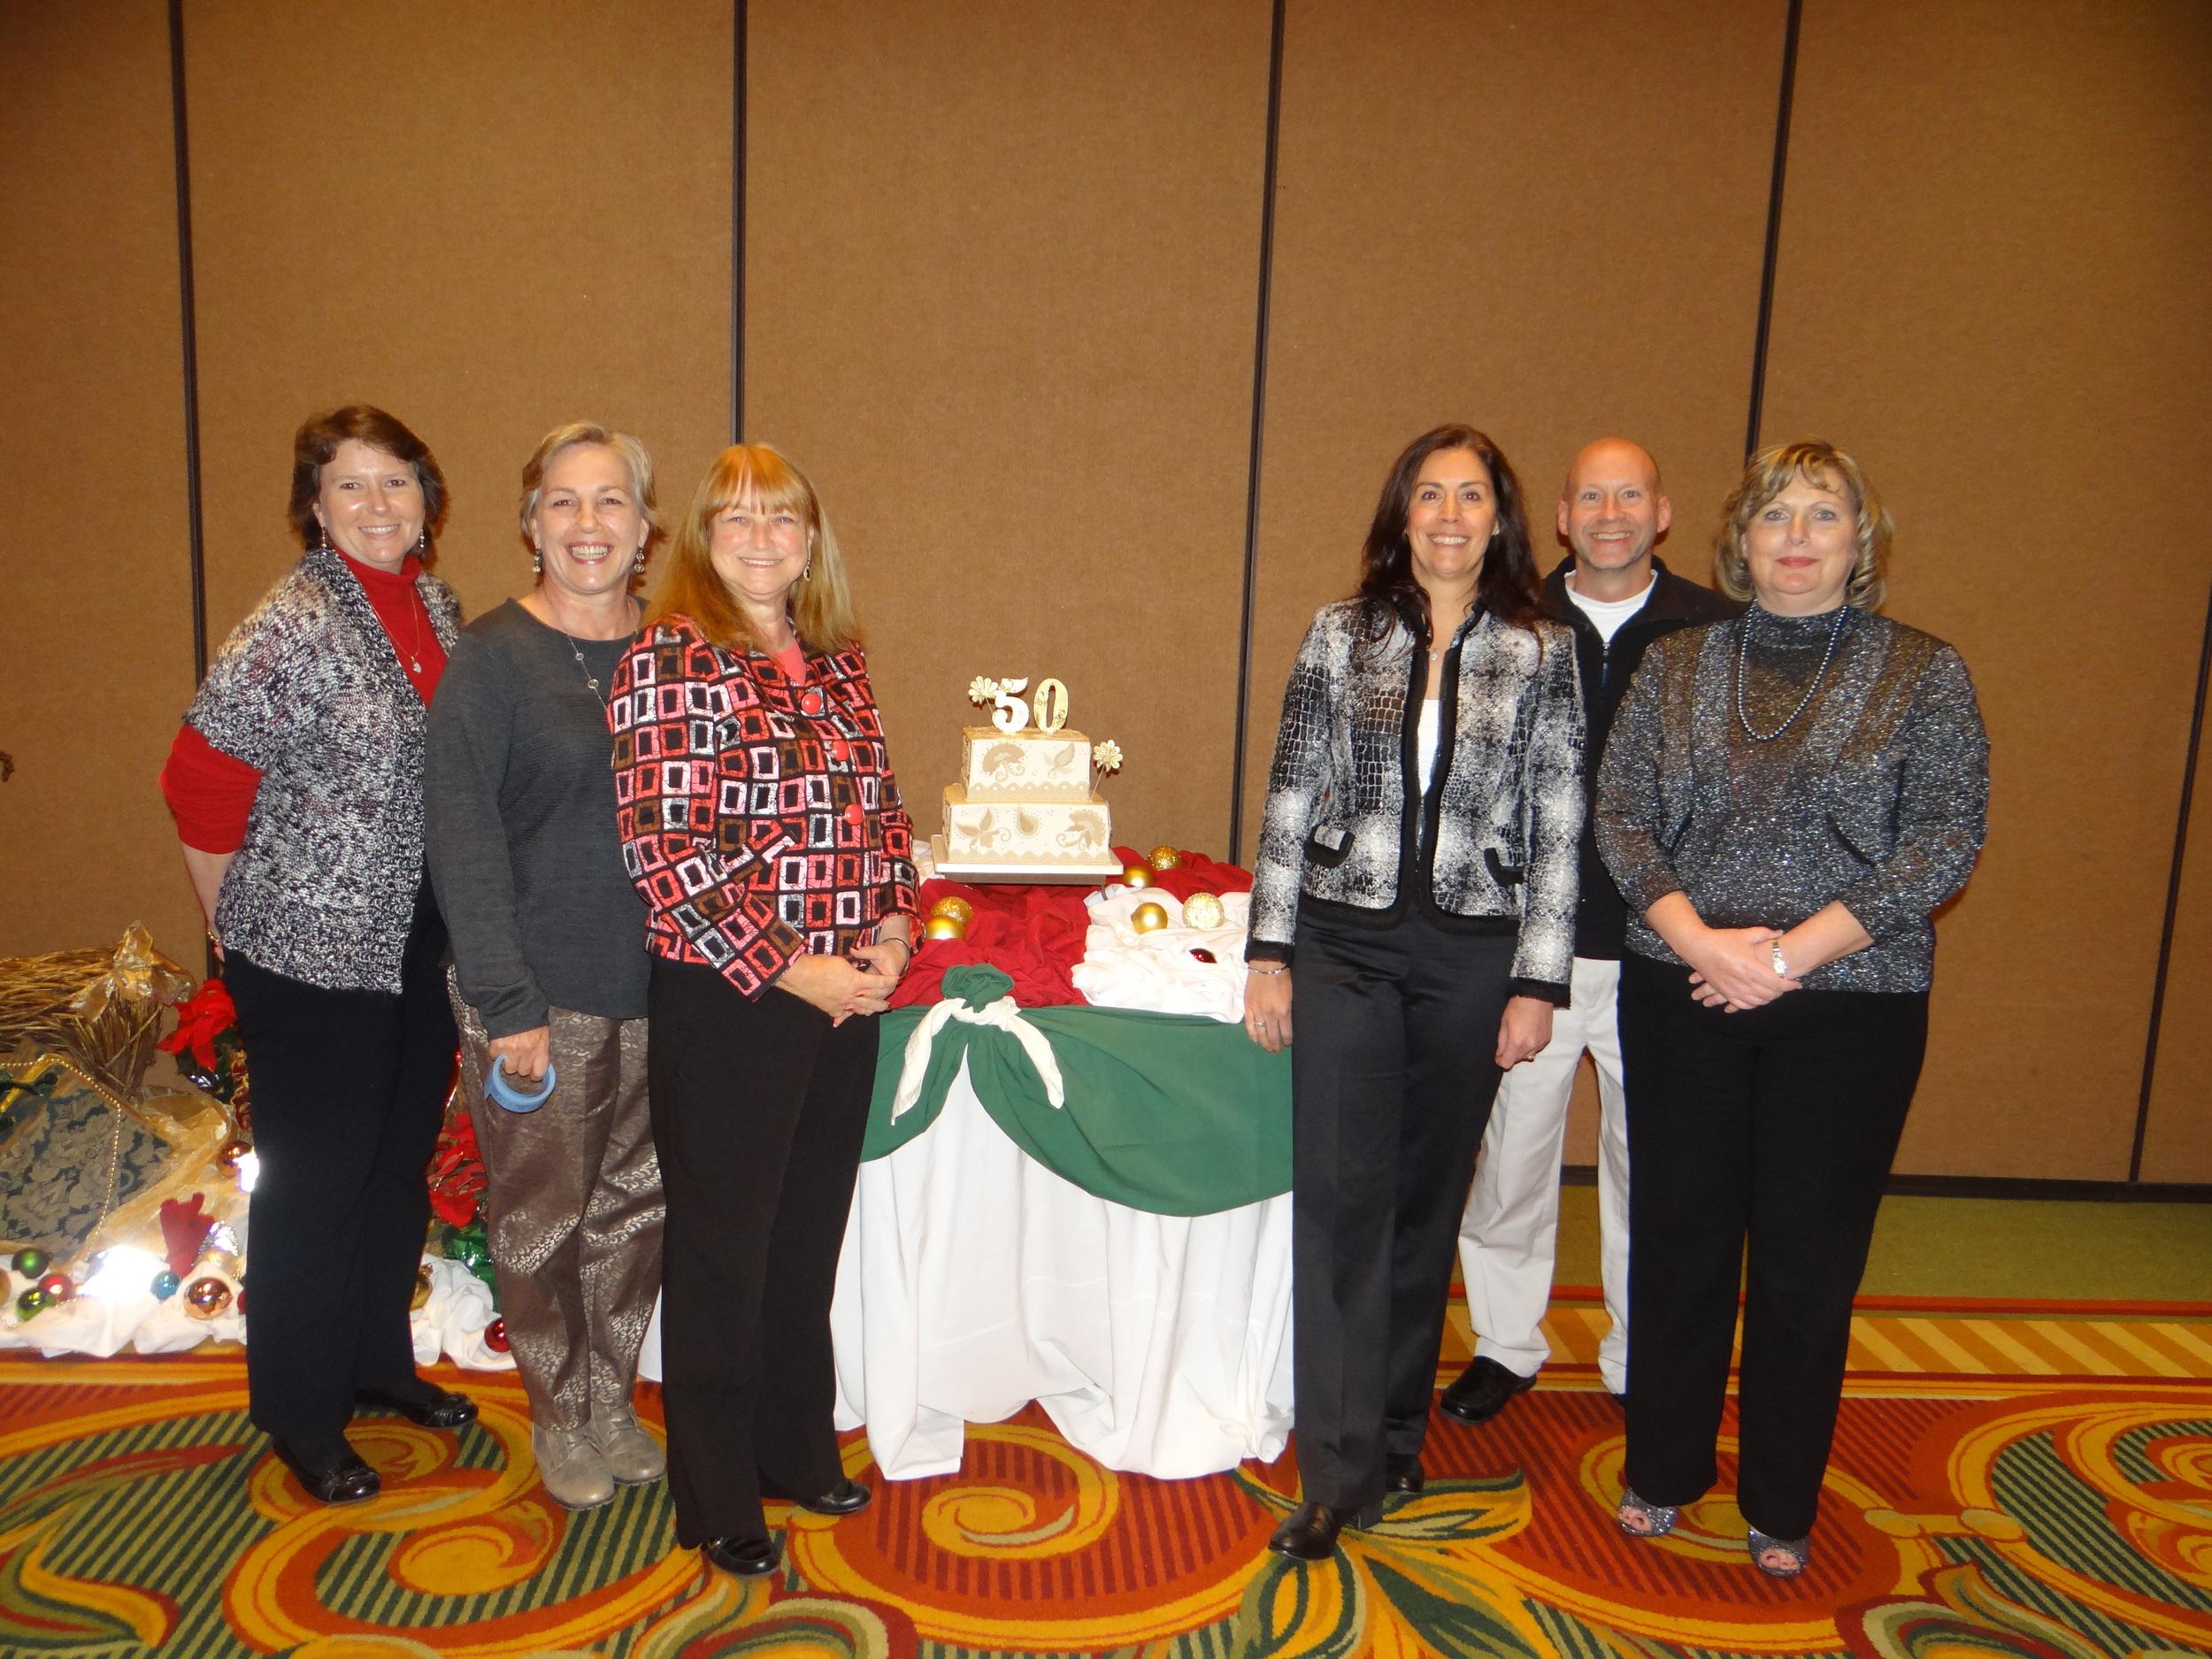 The RIMS Board Members celebrating the 50th Anniversary.